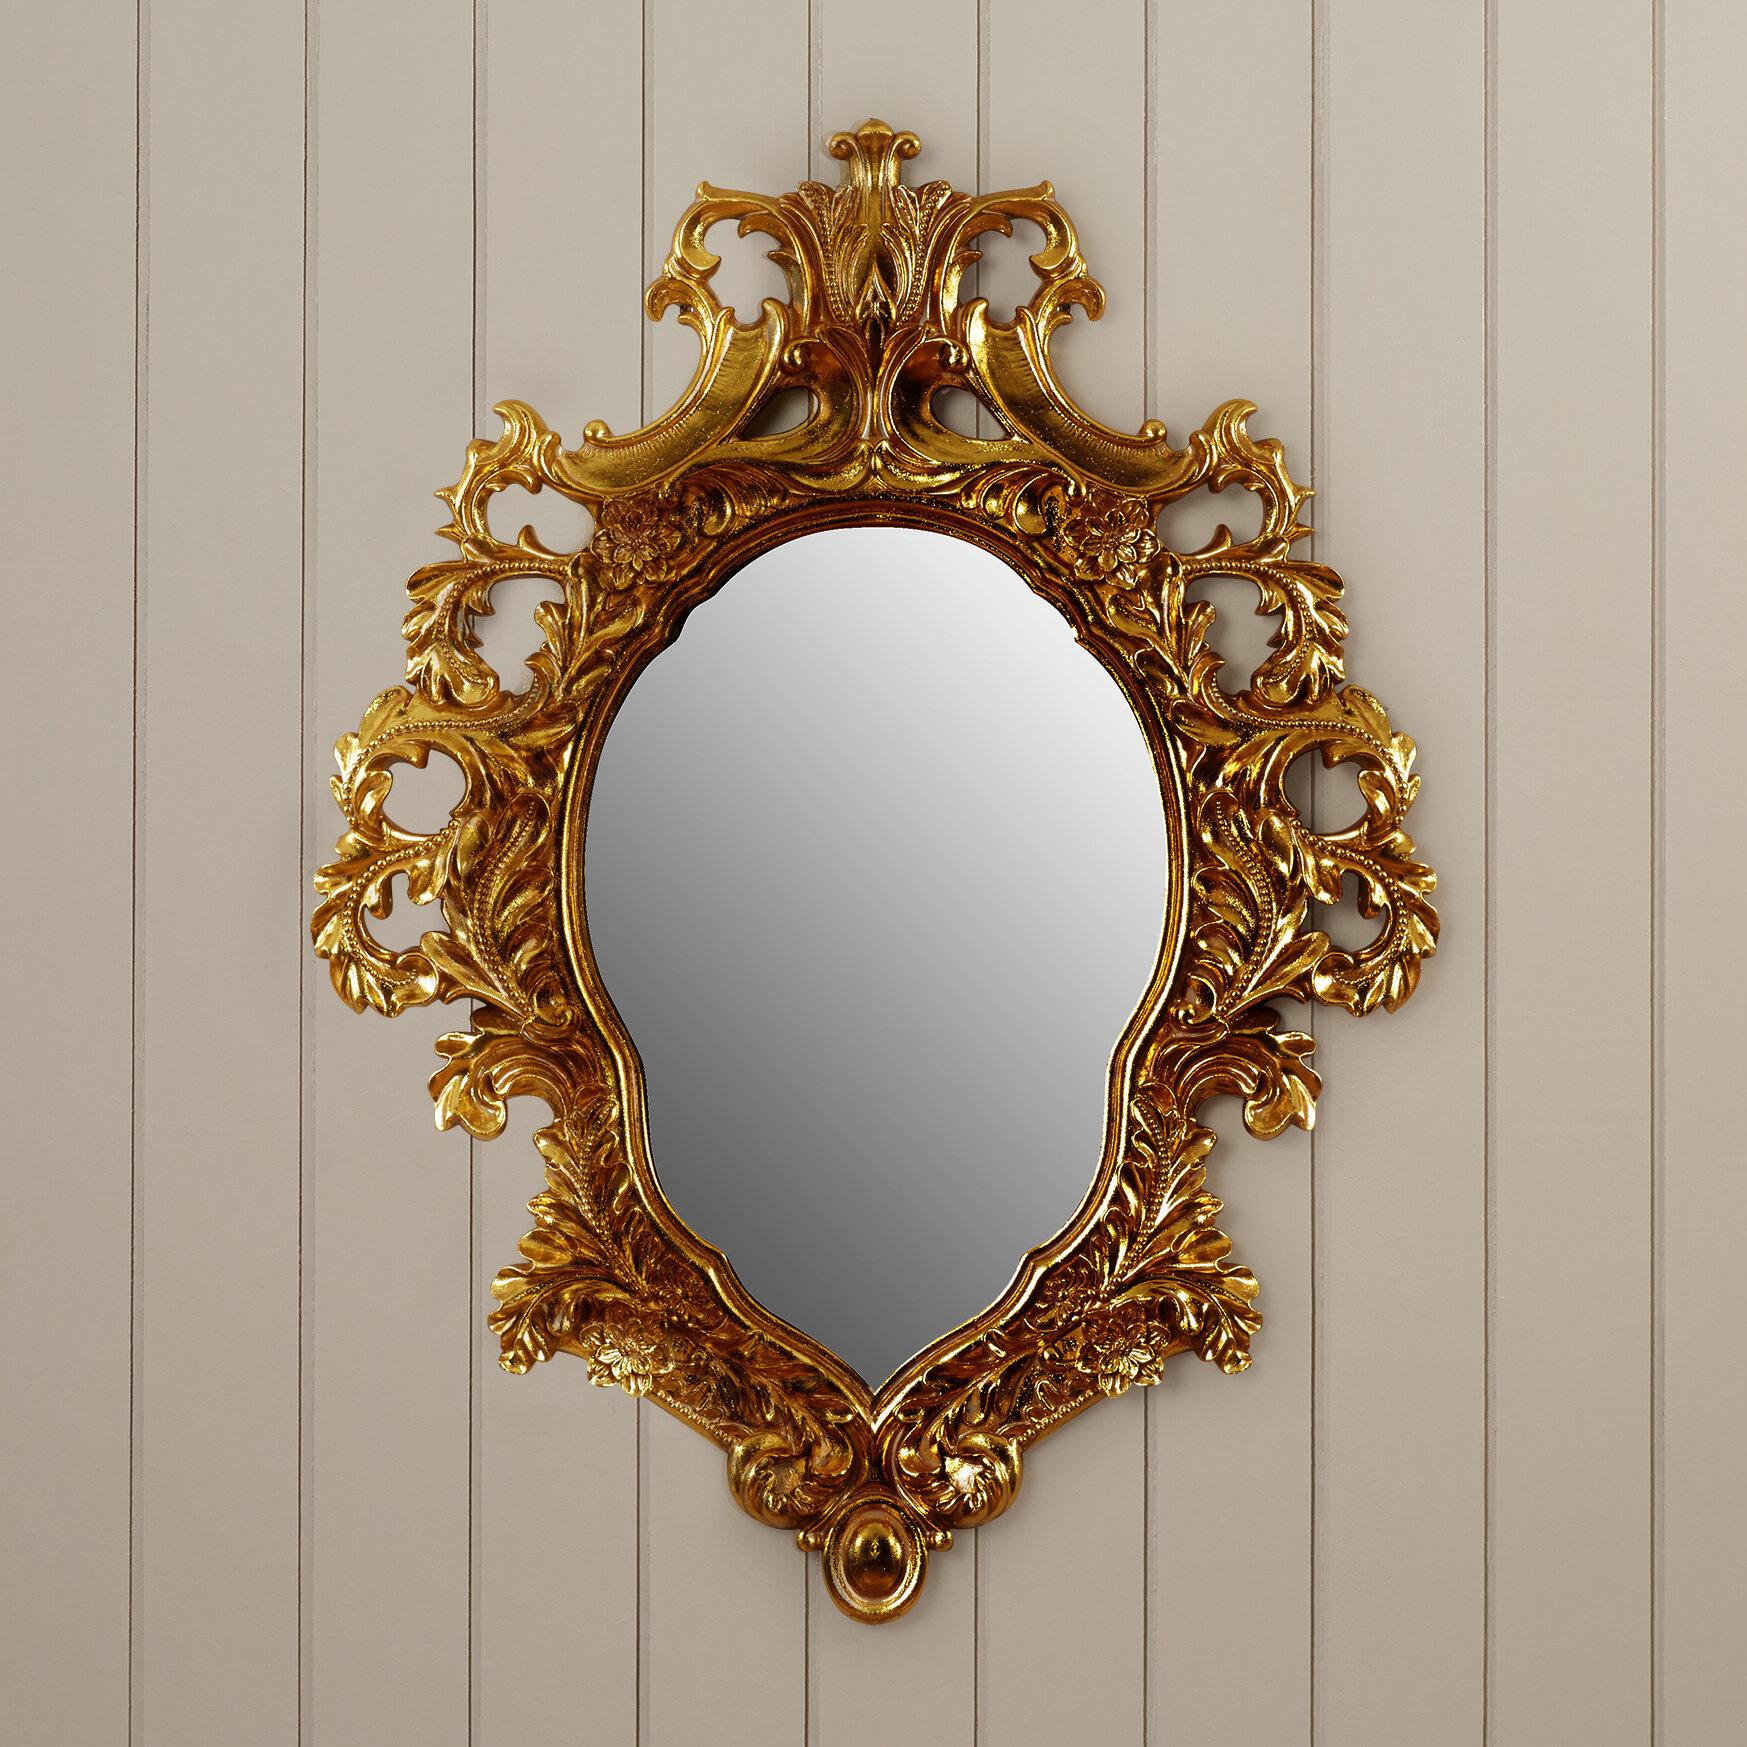 Design Toscano Madame Antoinette Salon Accent Mirror Reviews Wayfair Ca